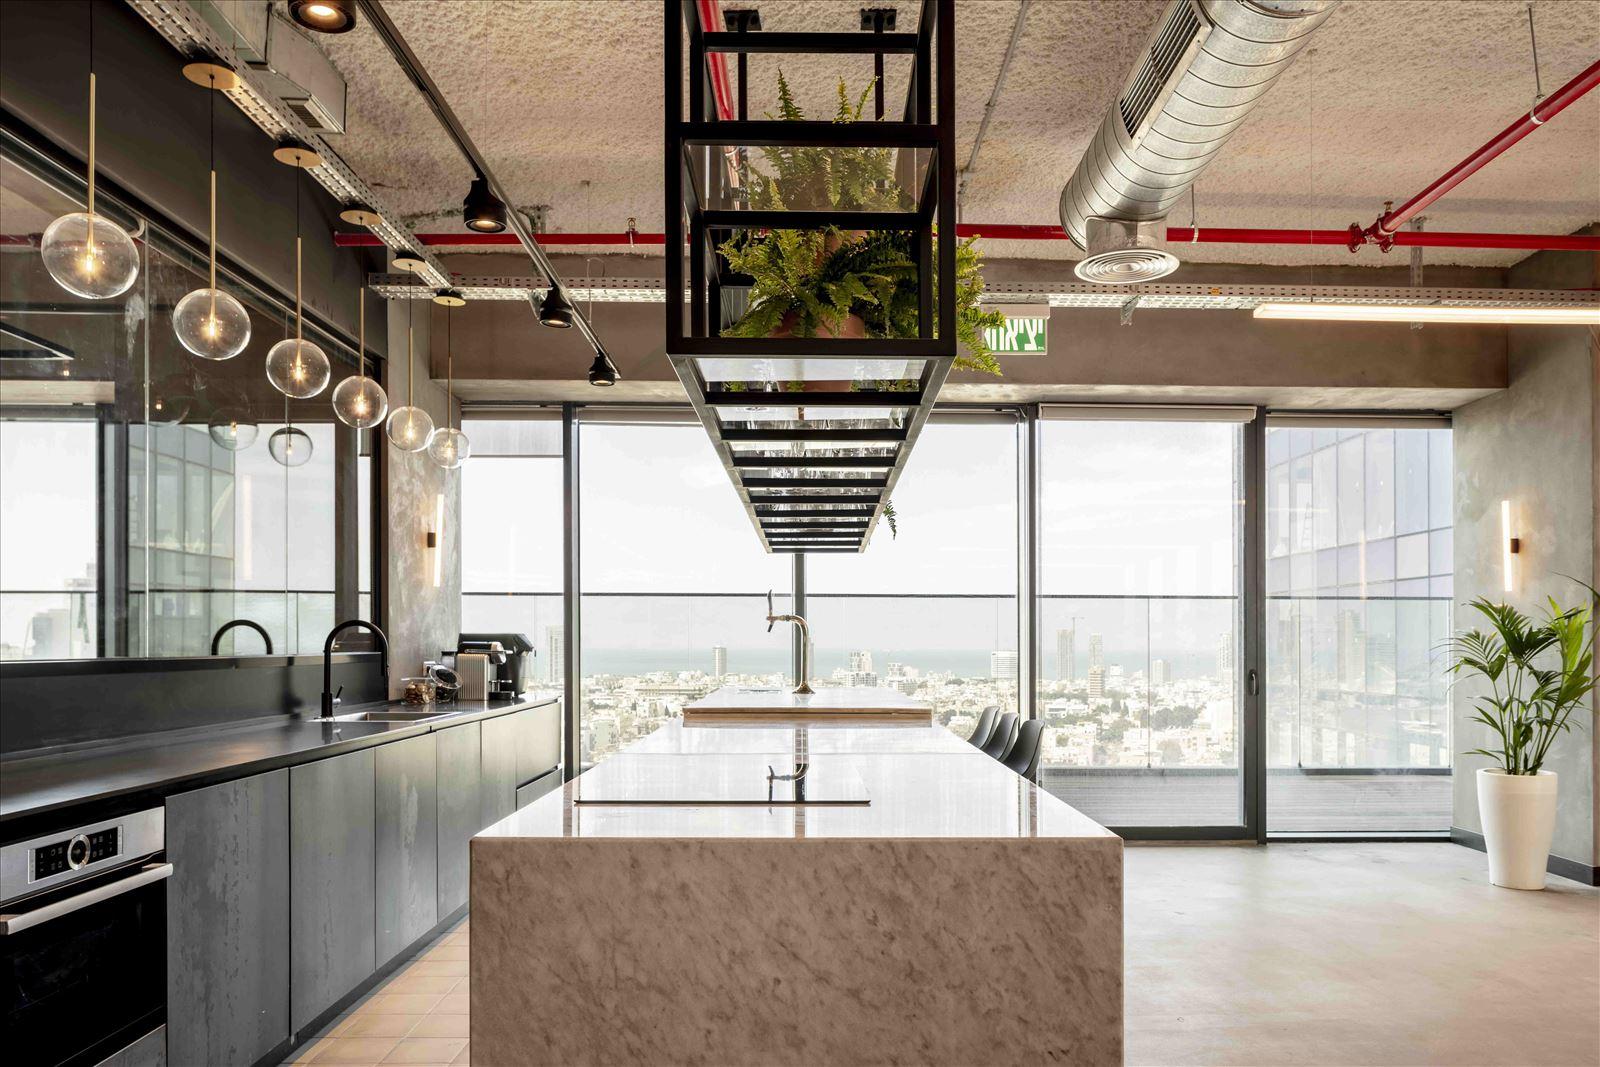 Office project התאורה במטבח על ידי דורי קמחי